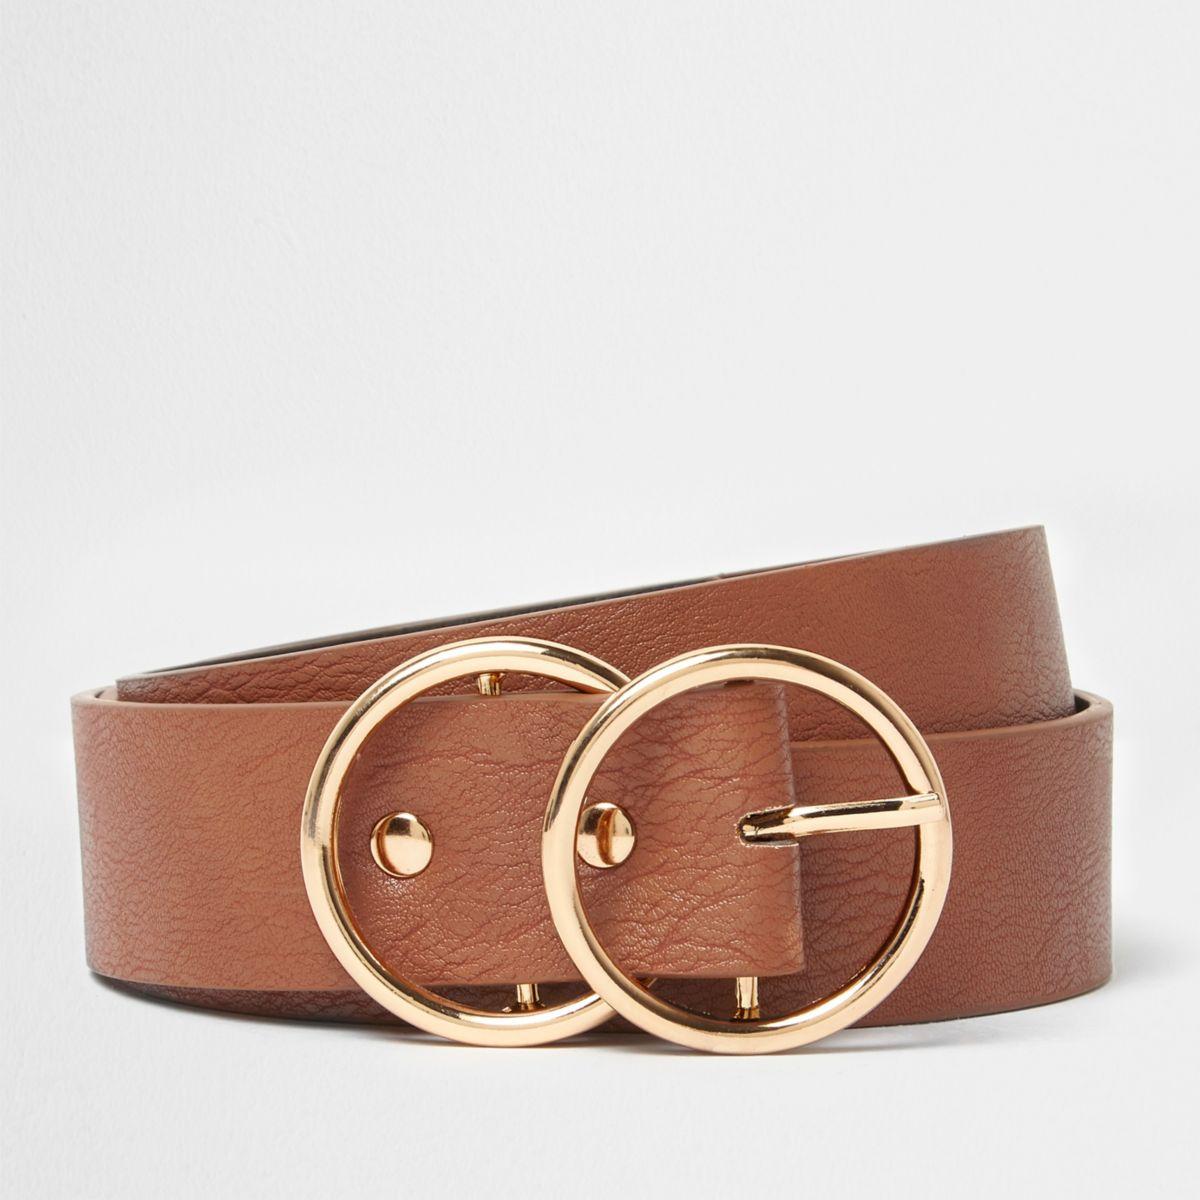 Tan double ring belt